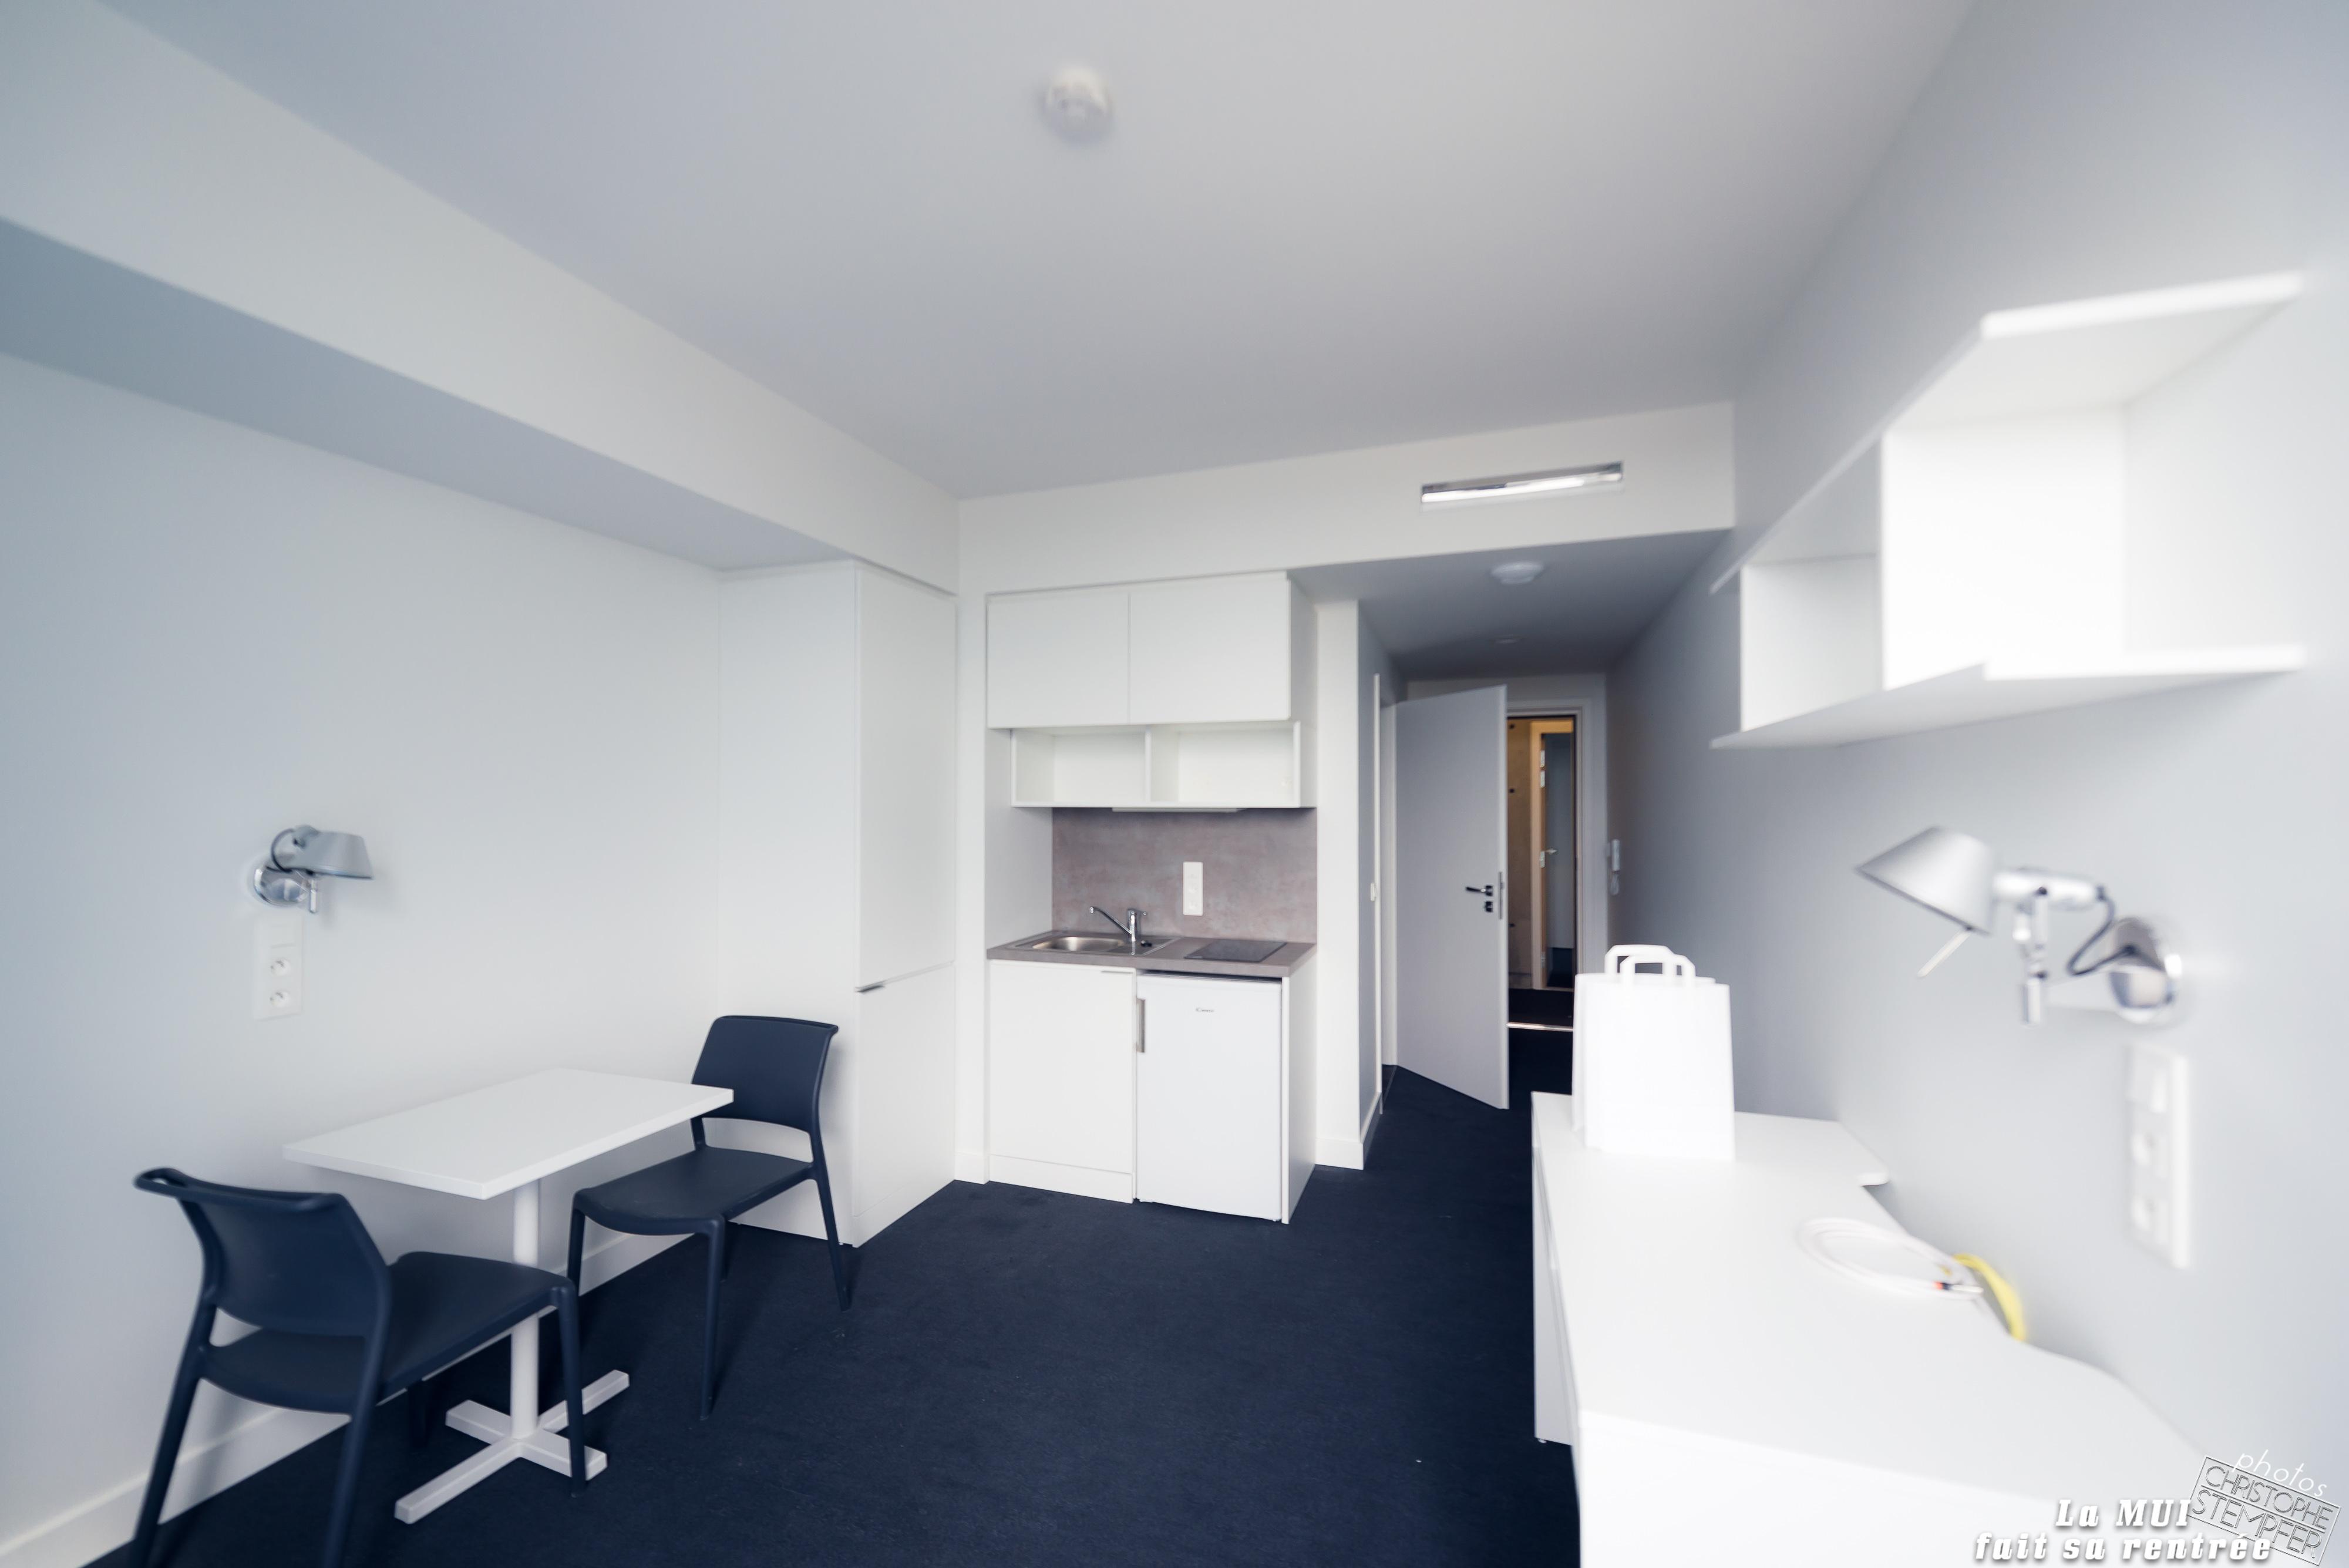 maison universitaire internationale amitel. Black Bedroom Furniture Sets. Home Design Ideas